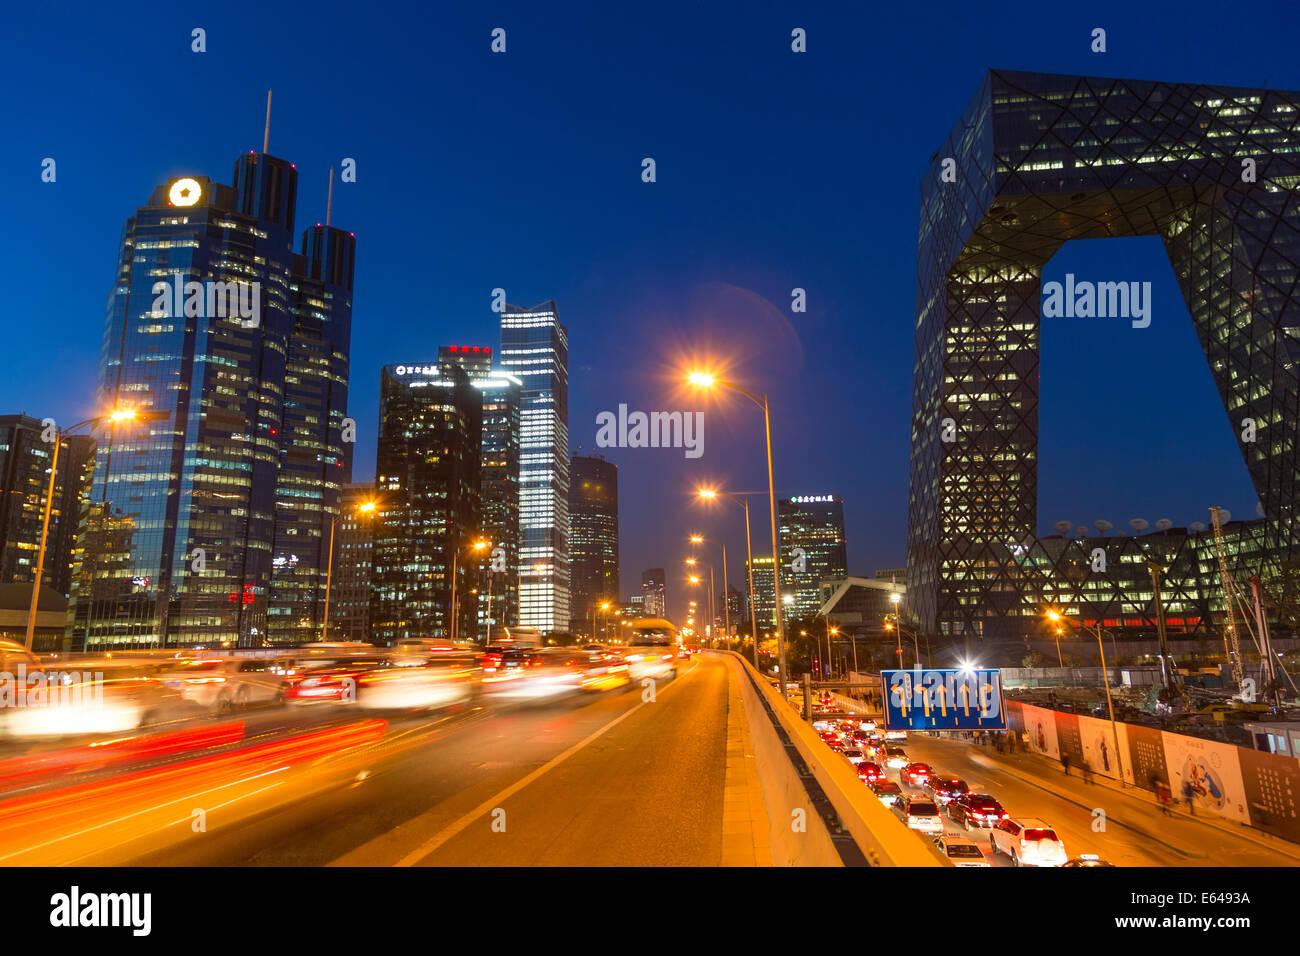 Central Business District & CCTV Gebäude in der Dämmerung, Peking, China Stockbild